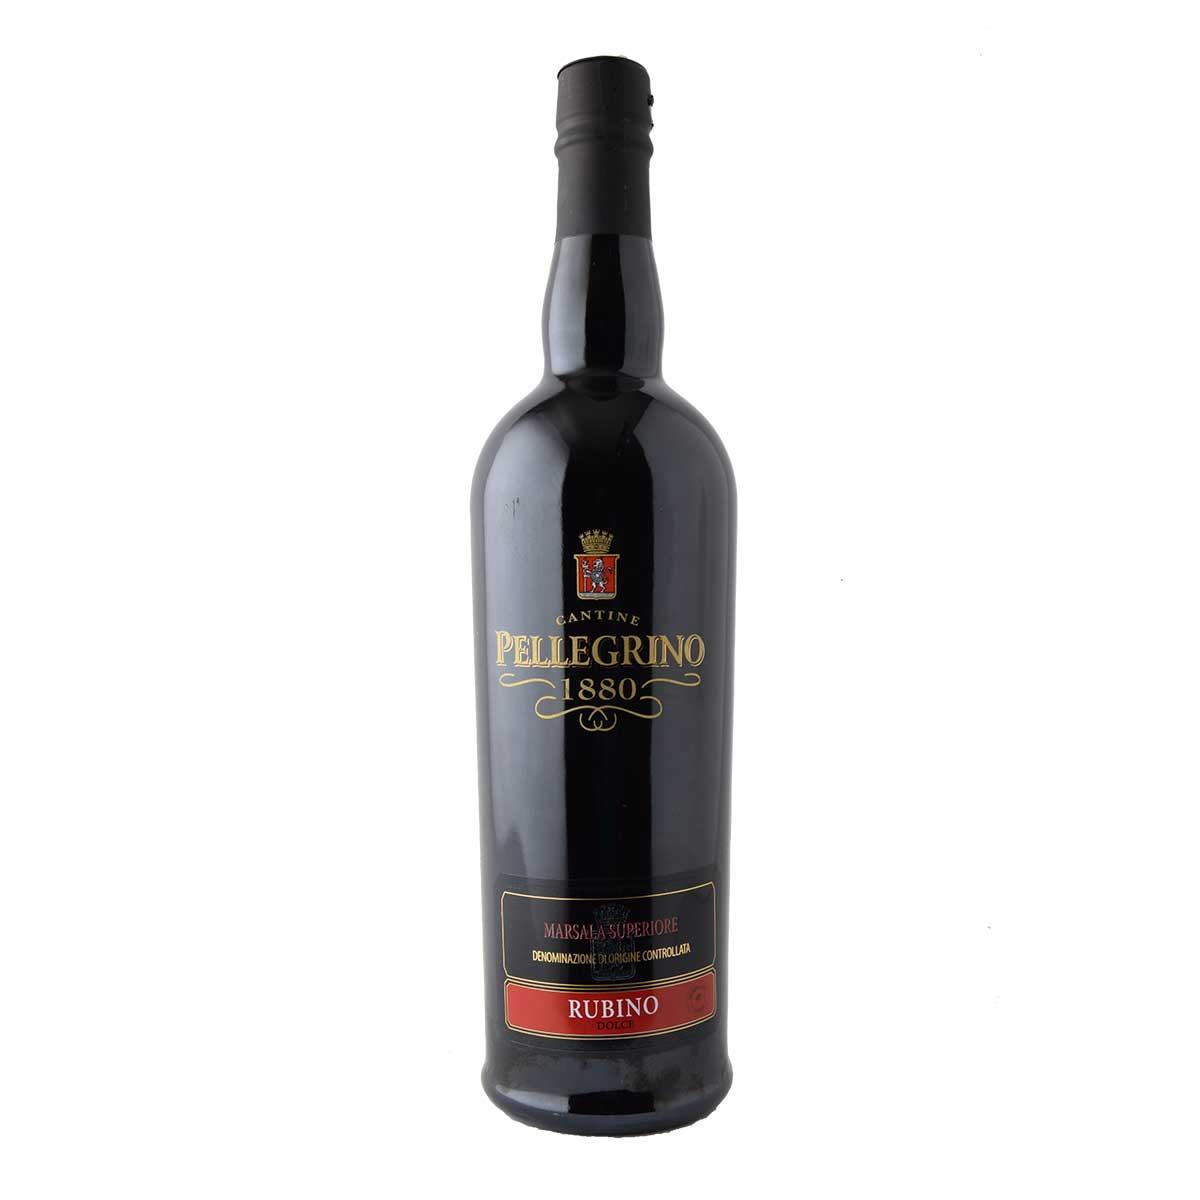 Pellegrino Marsala Superiore Rubino 750ml